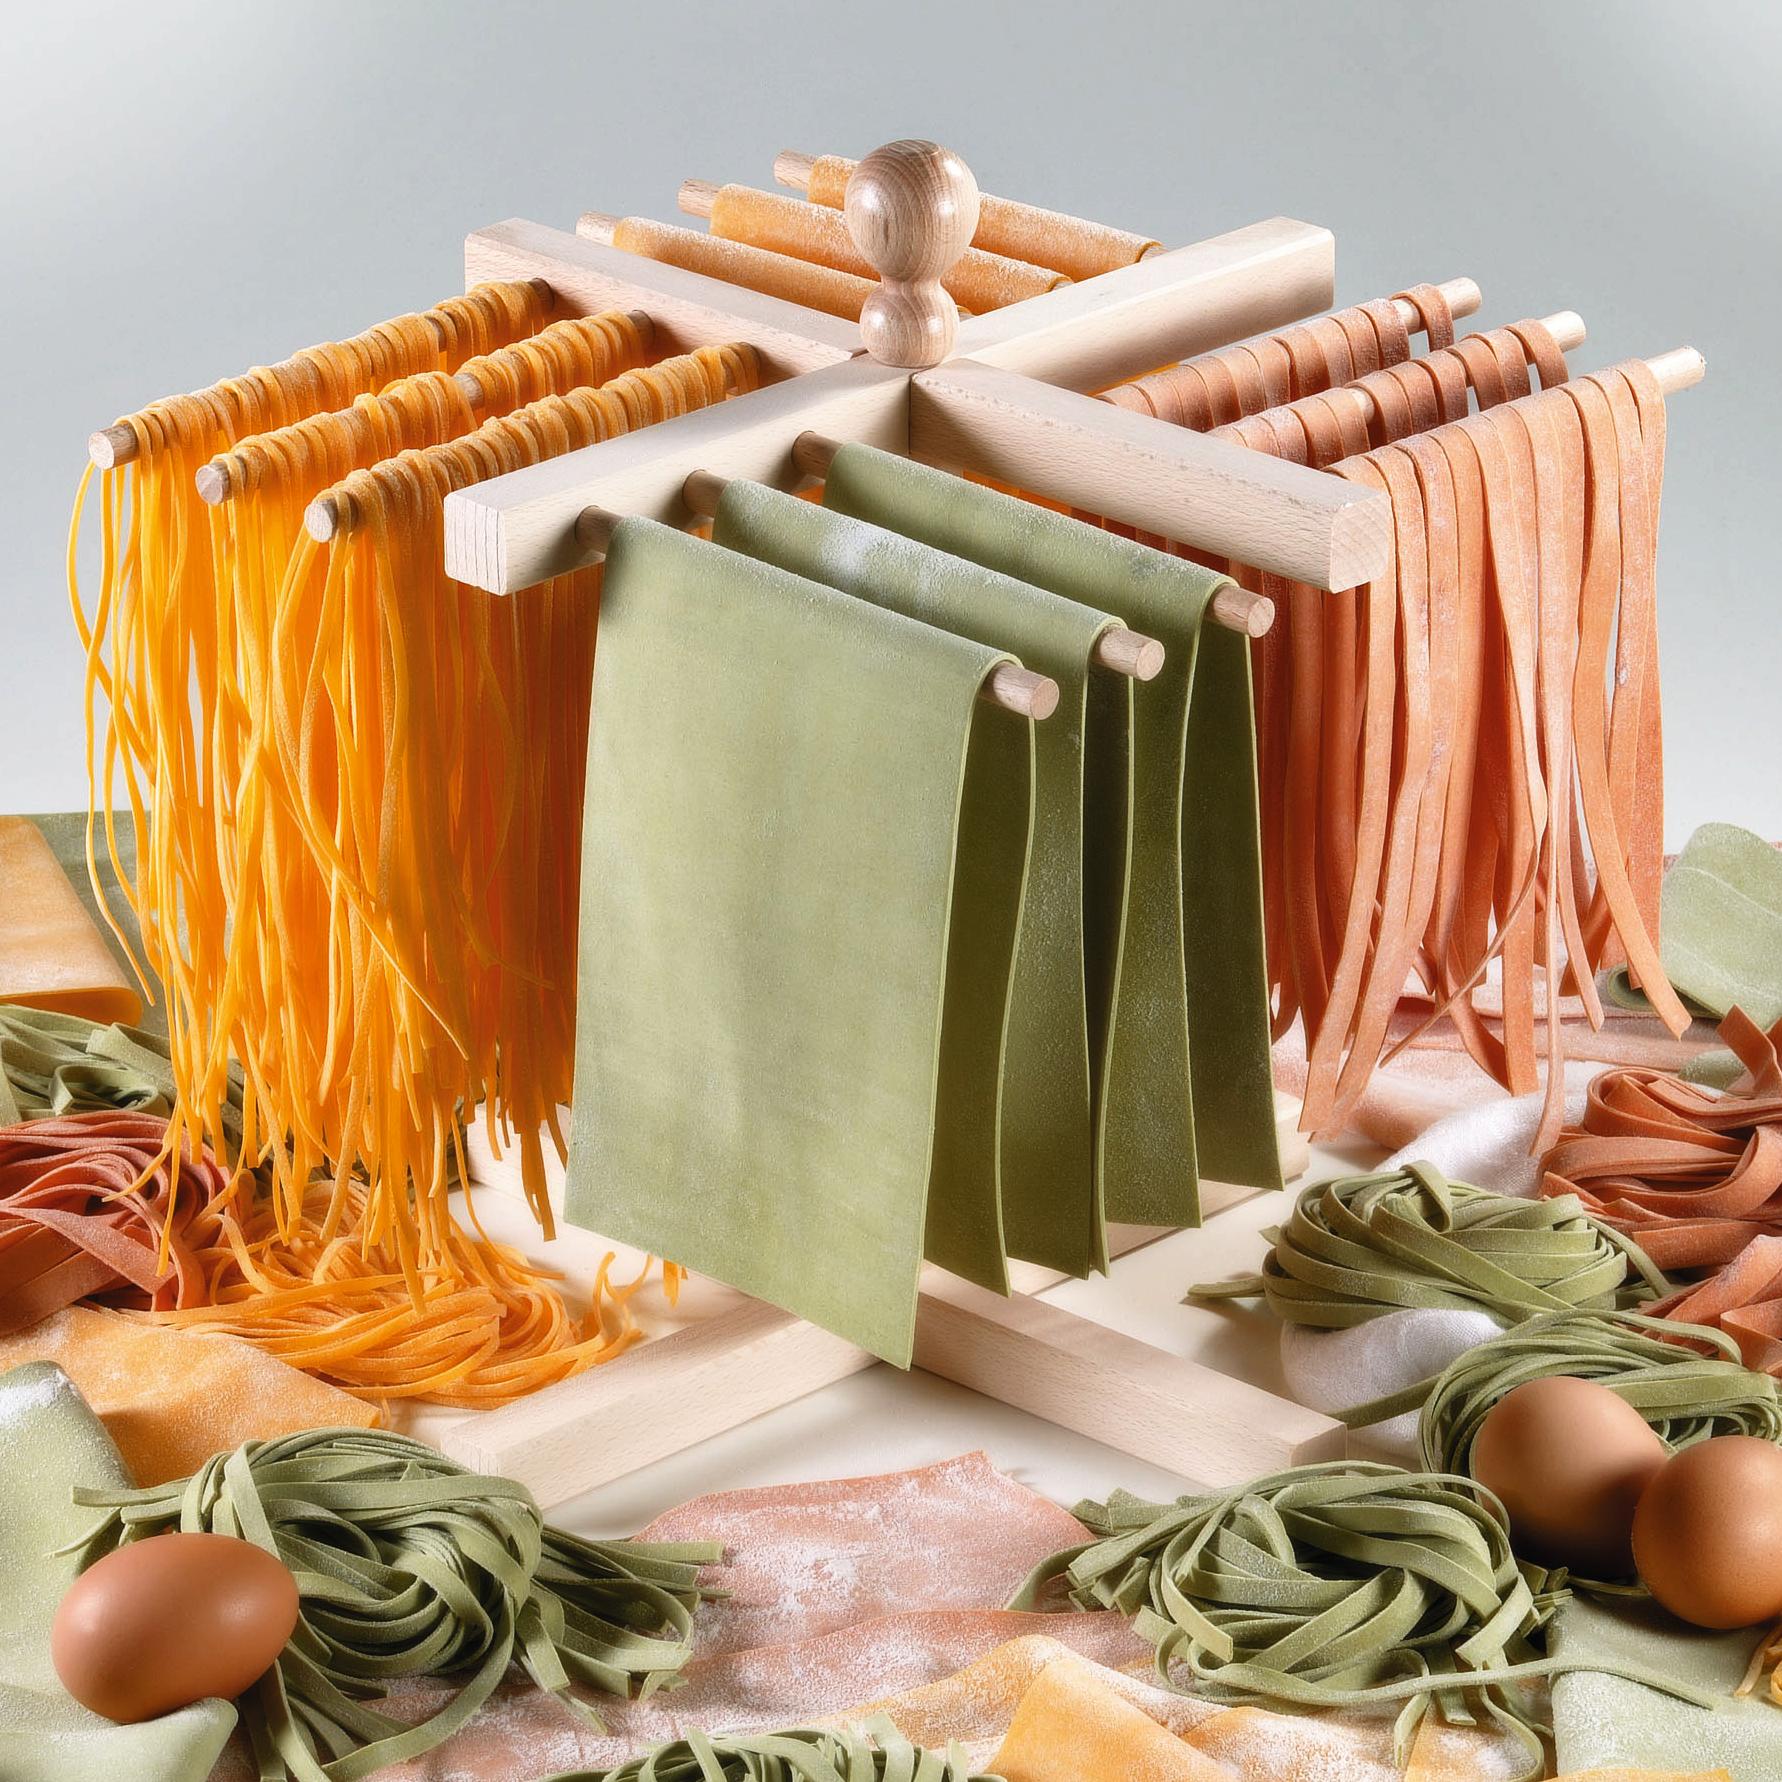 Imperia Beechwood Pasta Drying Rack